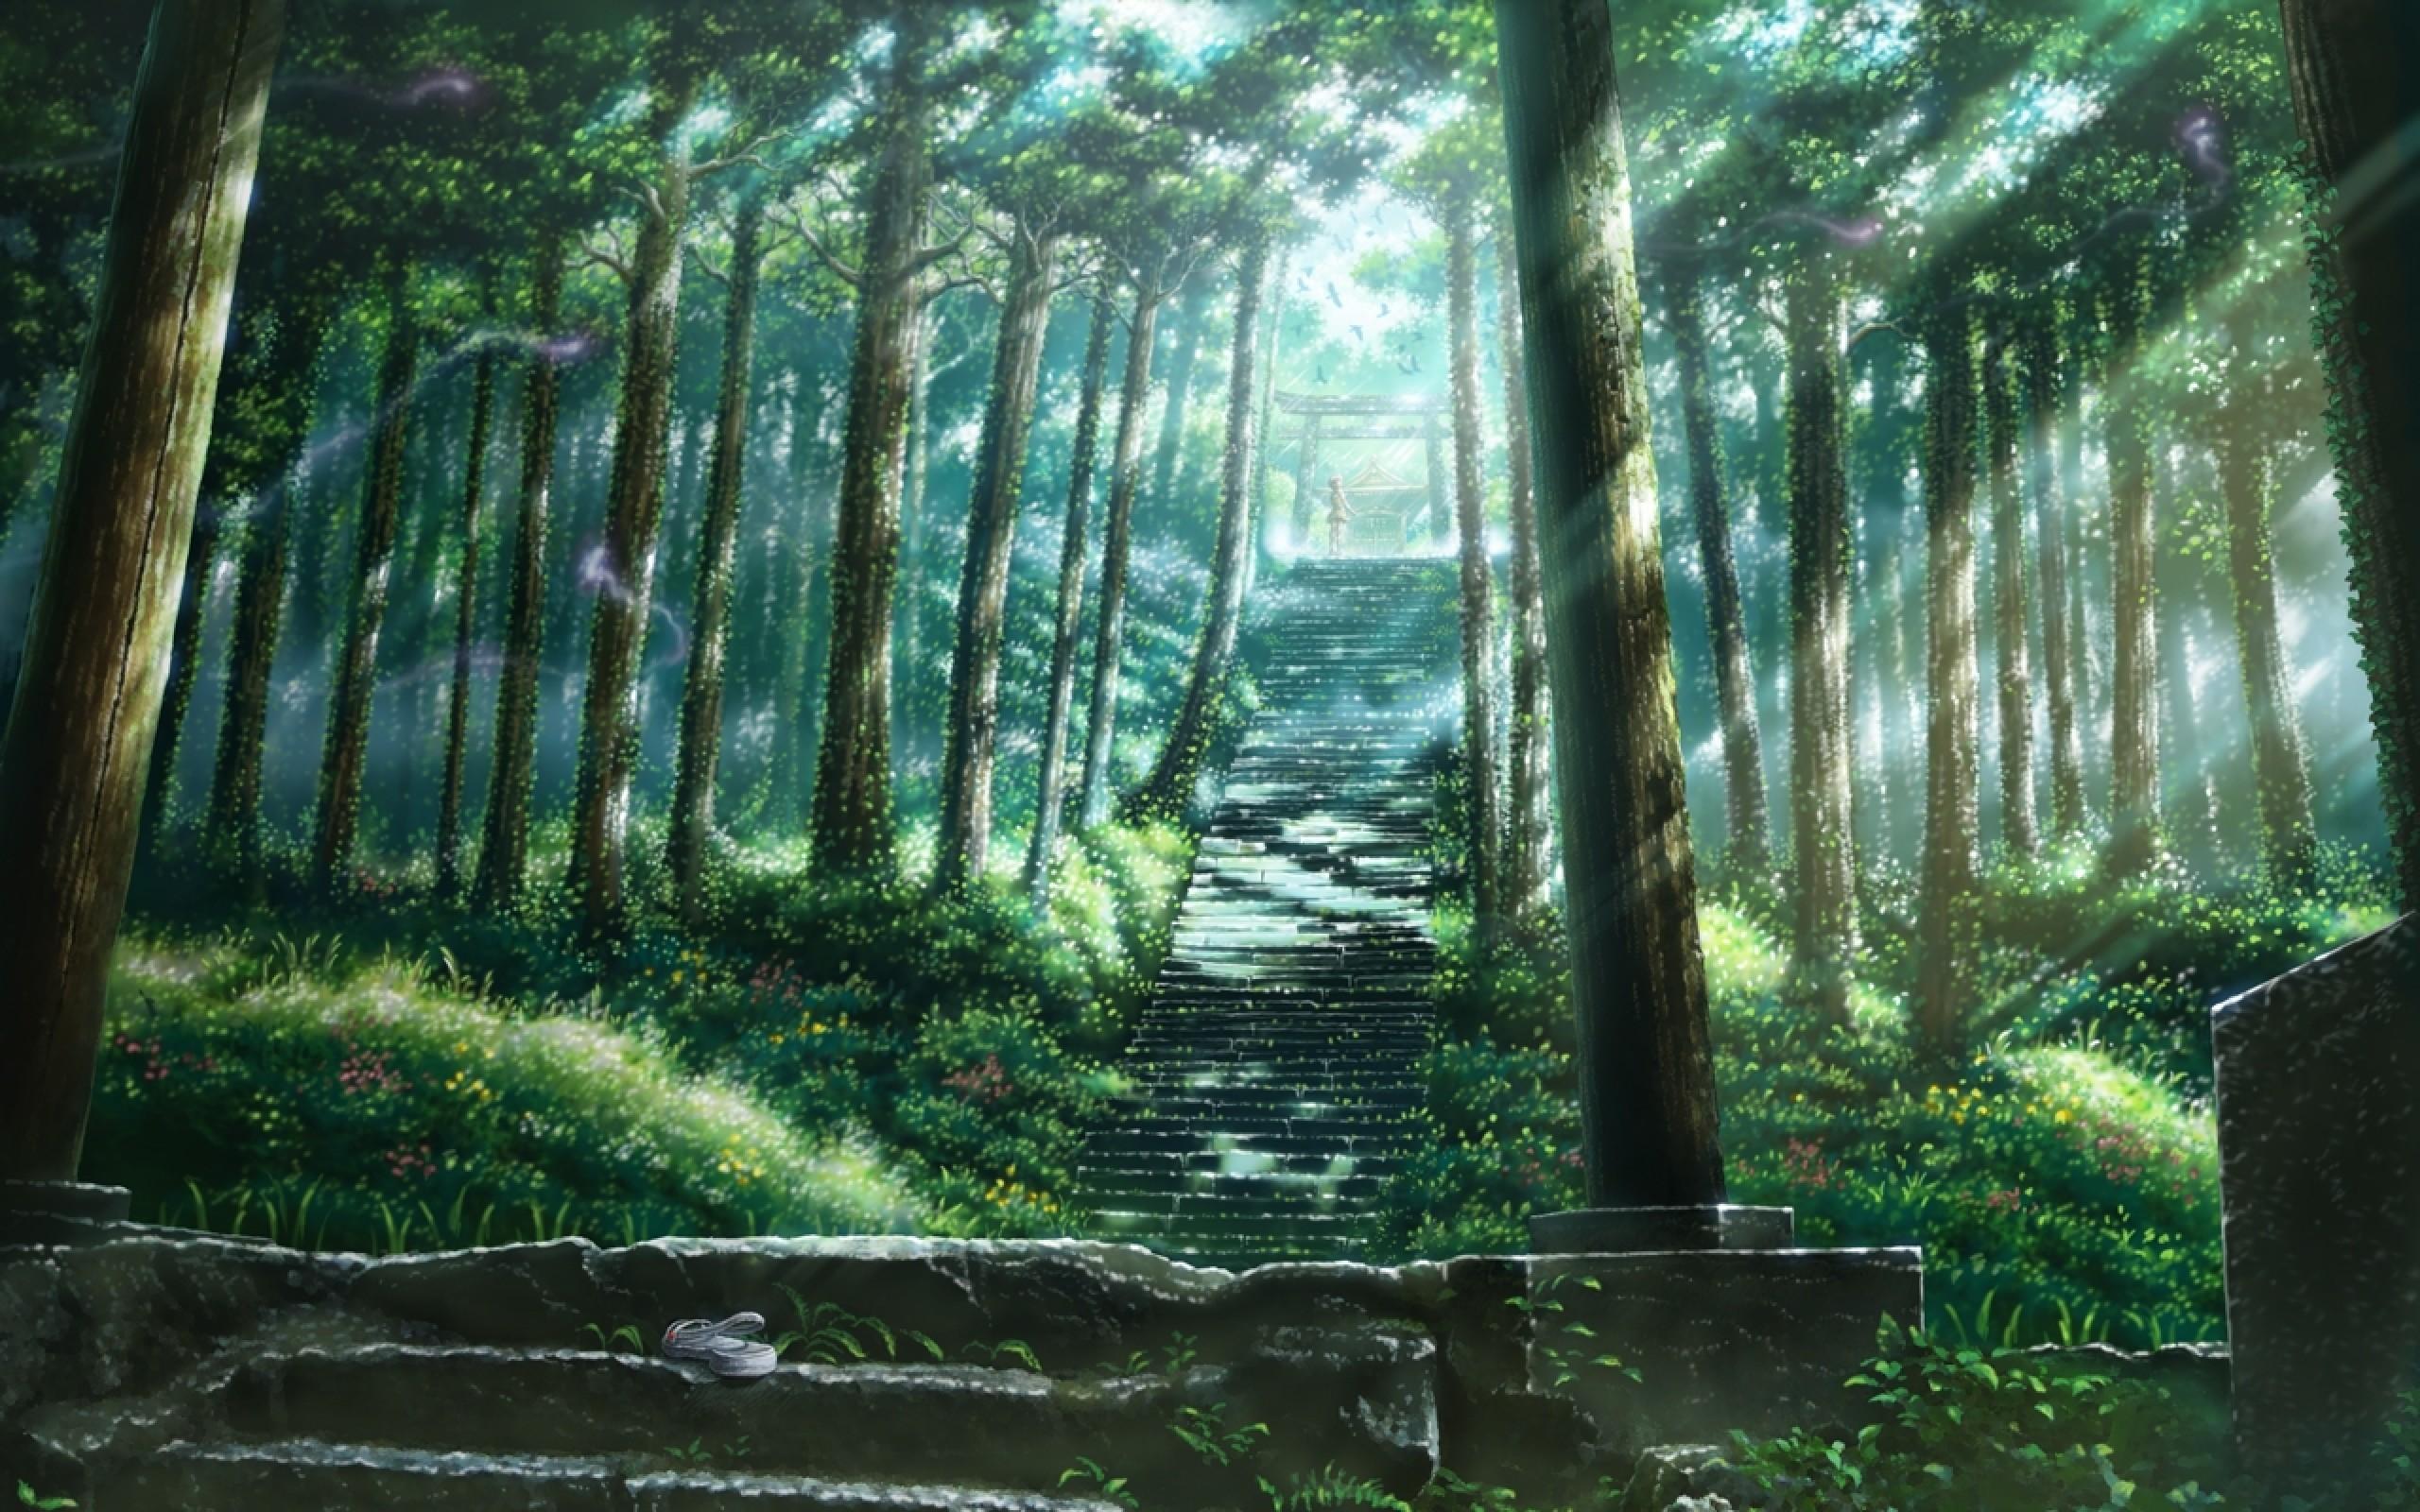 City, Scenery, Background, Anime Background, Anime Scenery, Visual Novel  Scenery, Visual Novel Background | Scenery and Background | Pinterest |  Anime …